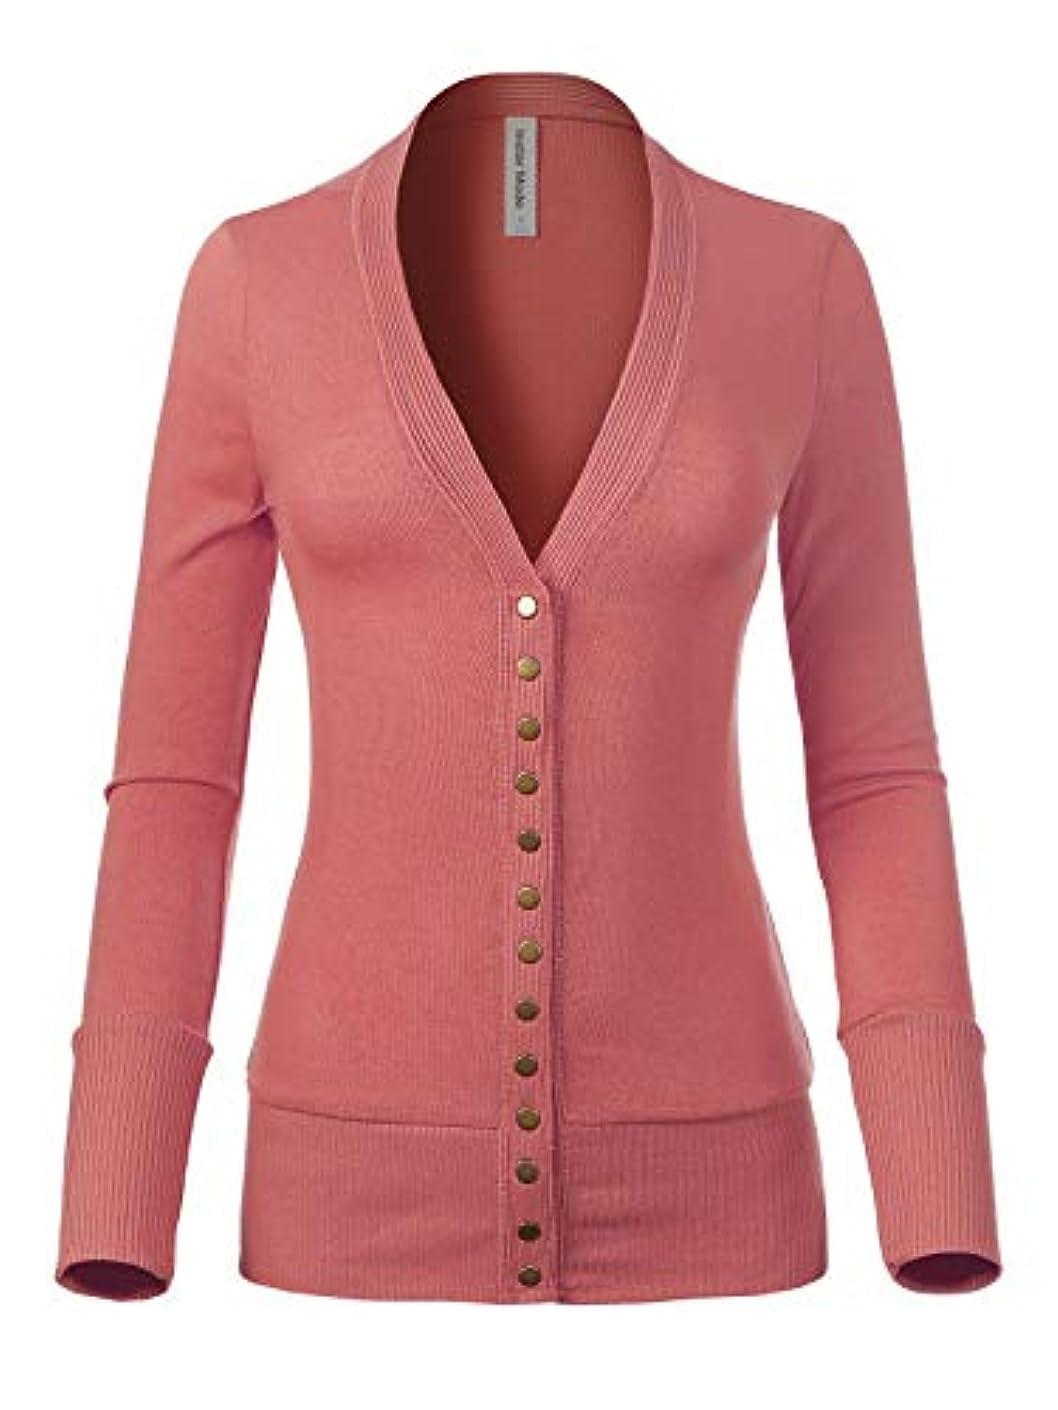 Design by Olivia Women's Soft Basic V-Neck Snap Button Down Knit Cardigan